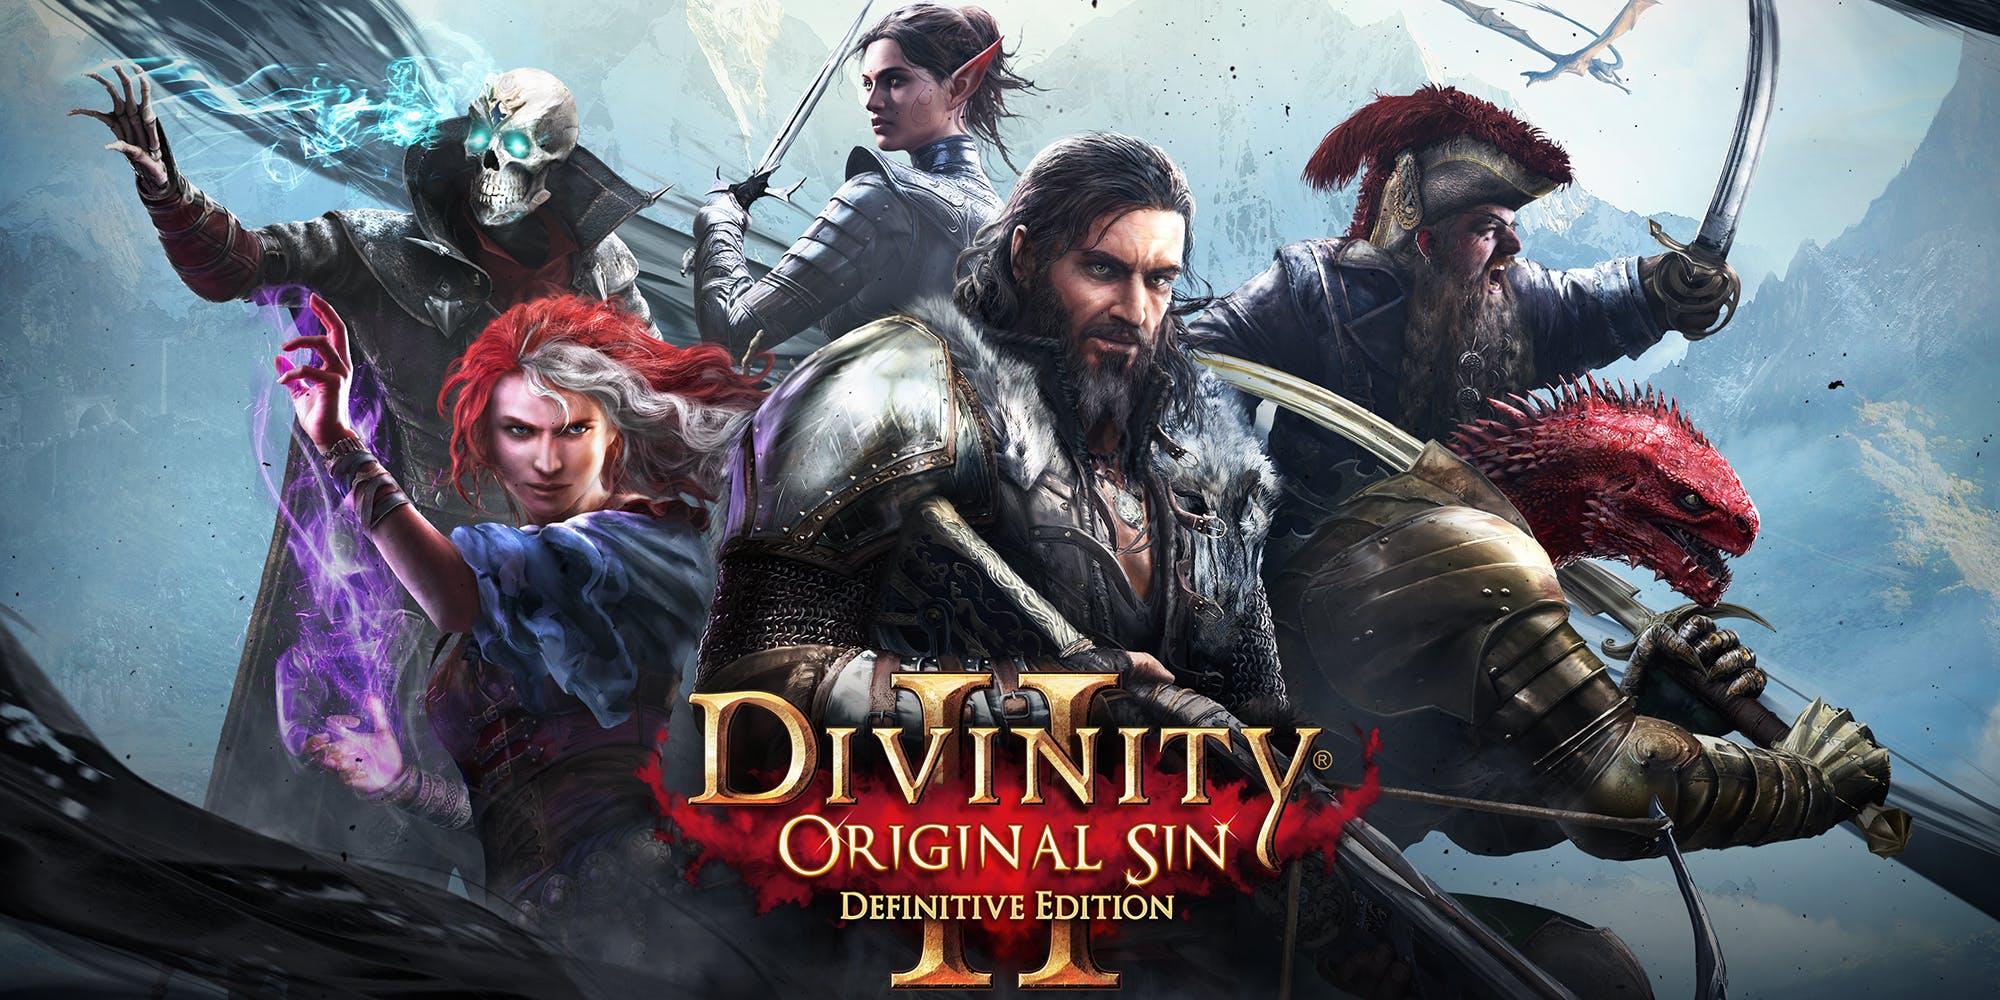 Divinity-Original-Sin-2-Definitive-Edition